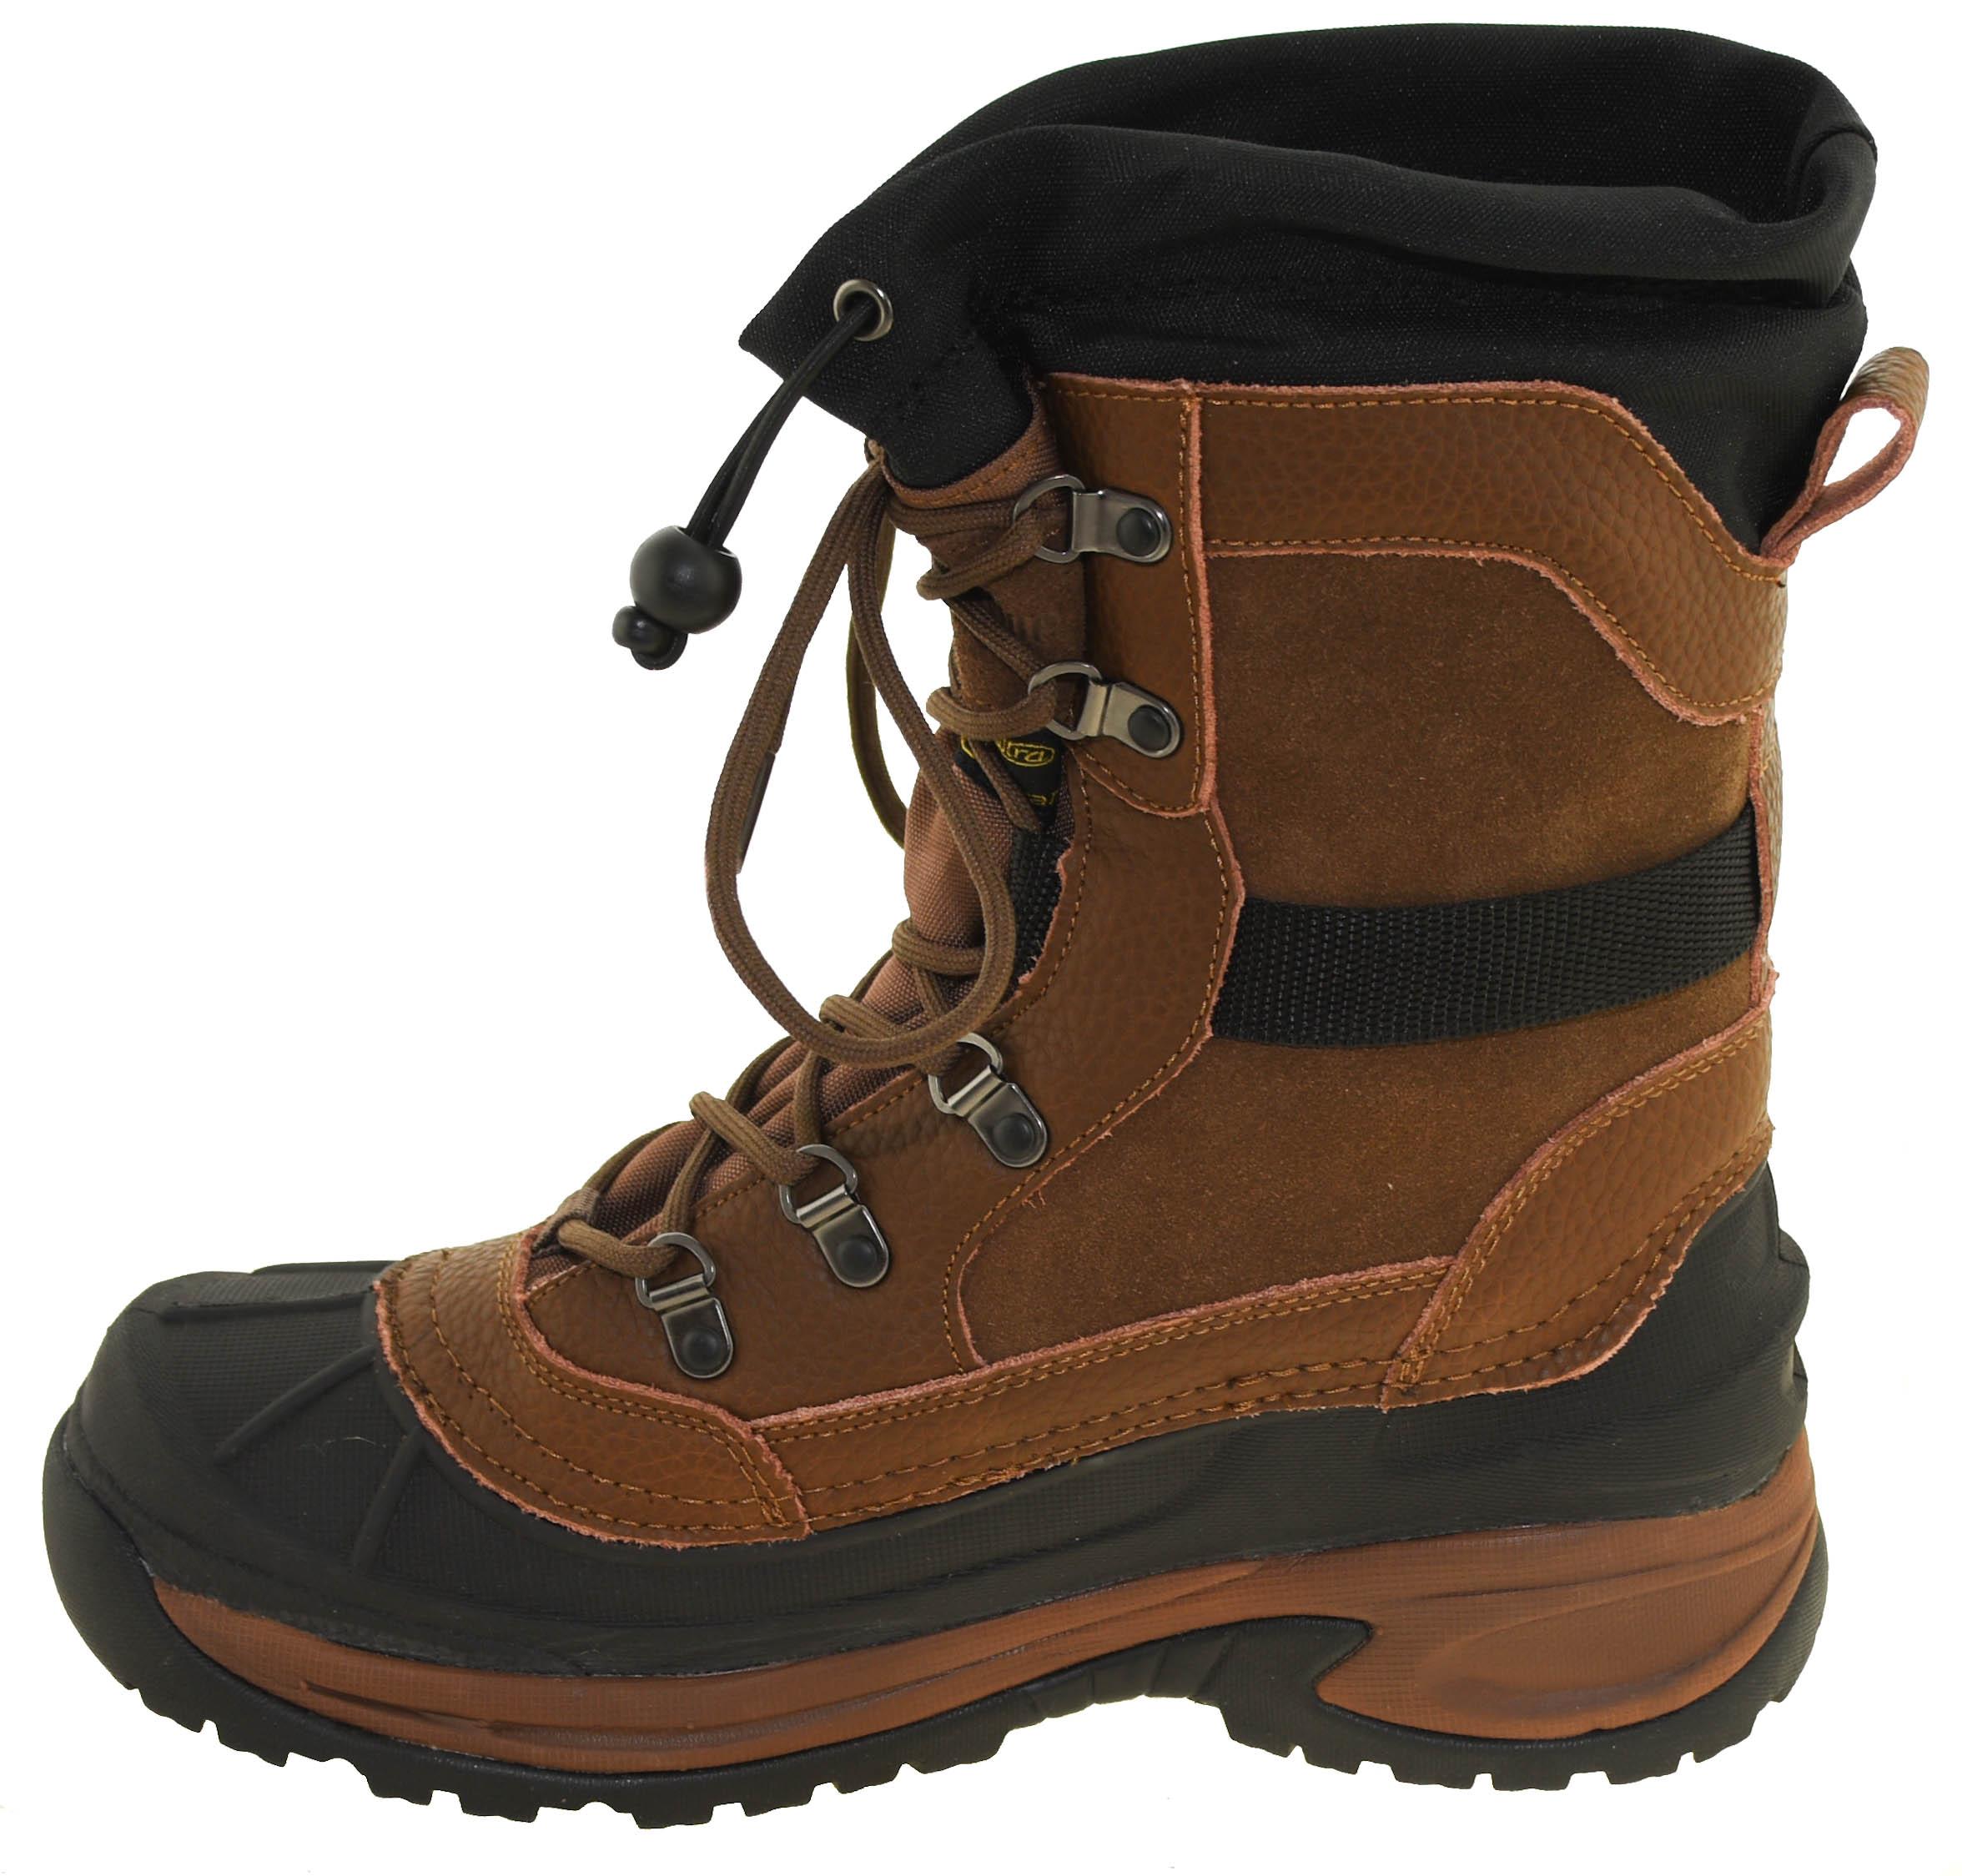 b462d10236496 Northside Men's Bozeman Waterproof Insulated Winter Boot Brown 916432